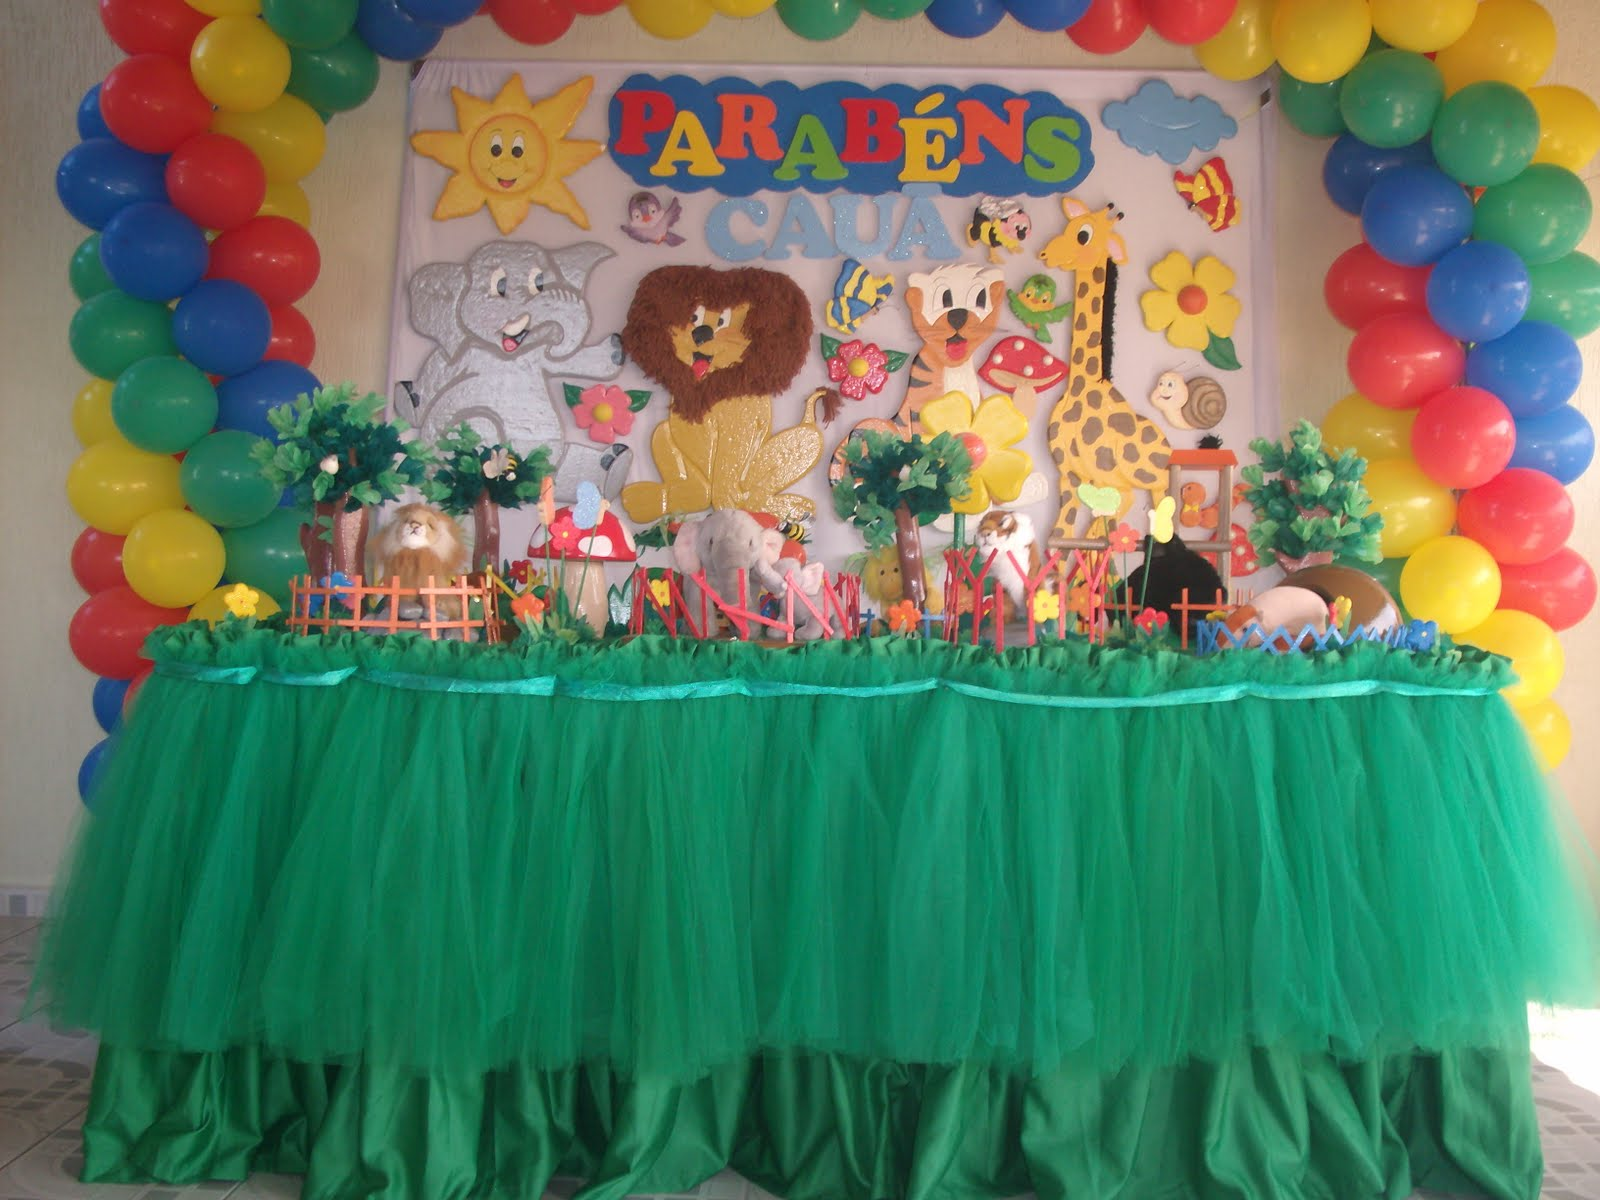 festa jardim zoologico : festa jardim zoologico:Enviar por e-mail BlogThis! Compartilhar no Twitter Compartilhar no